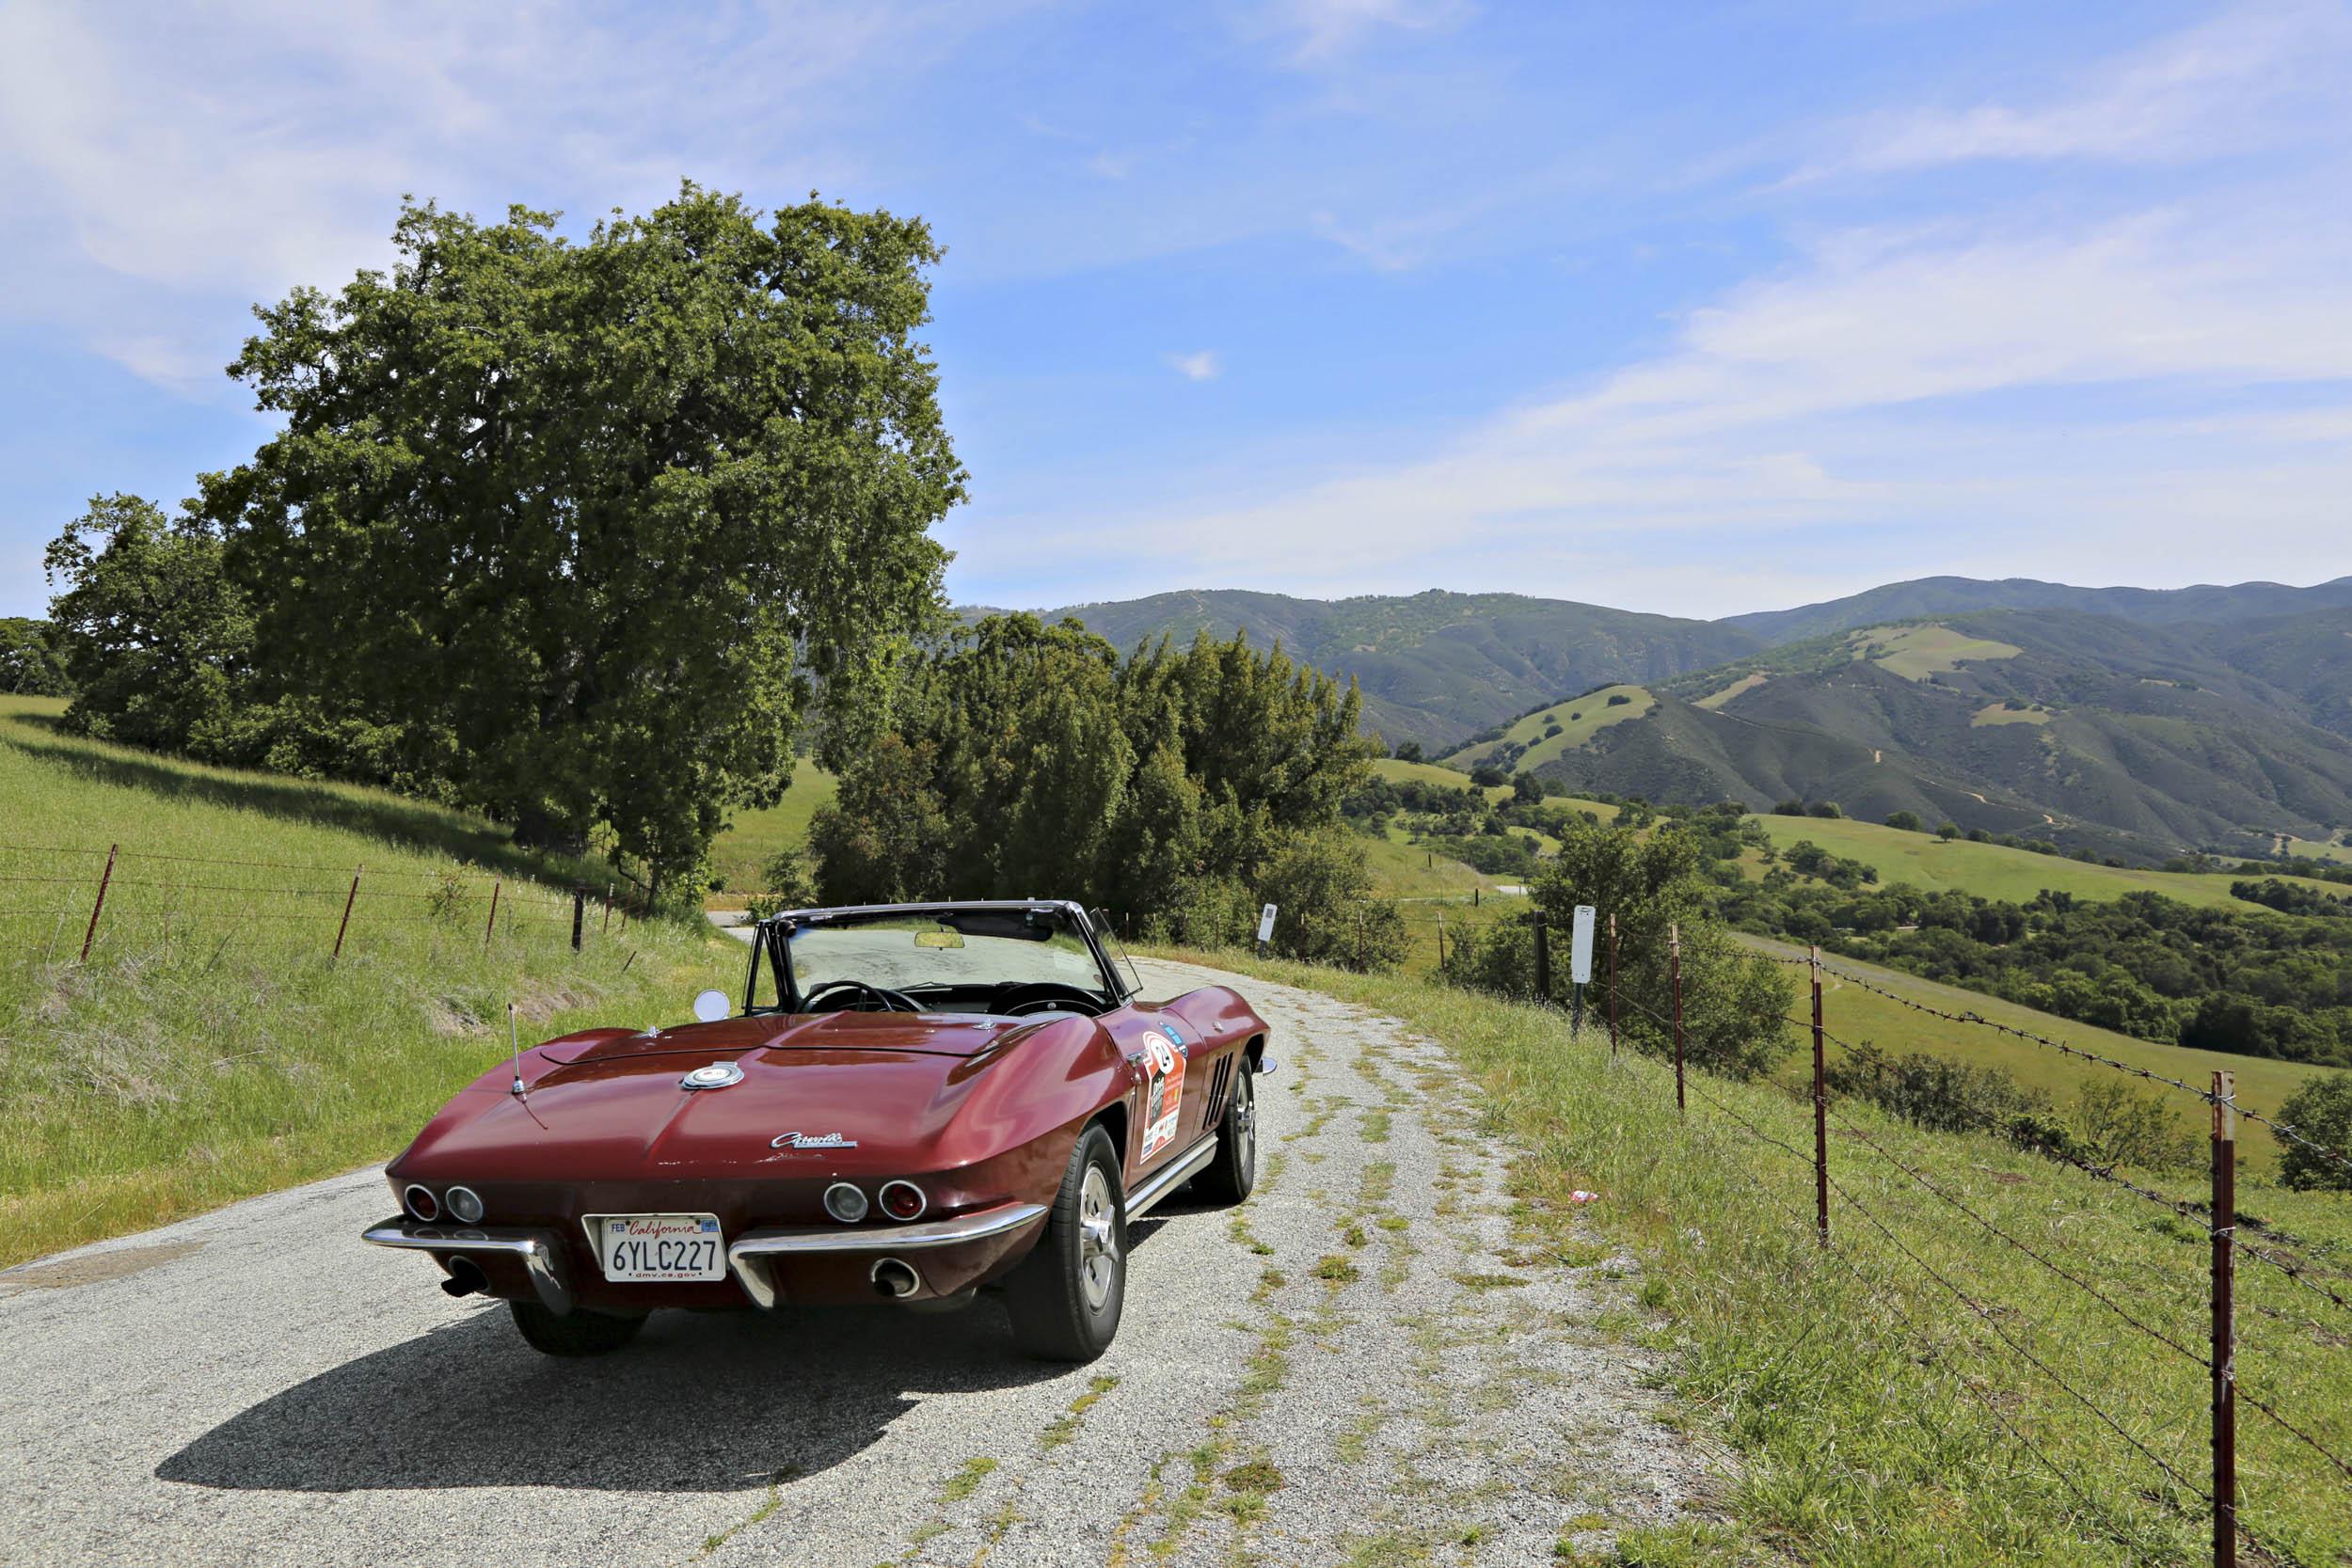 1965 Chevrolet Corvette convertible driving back trails